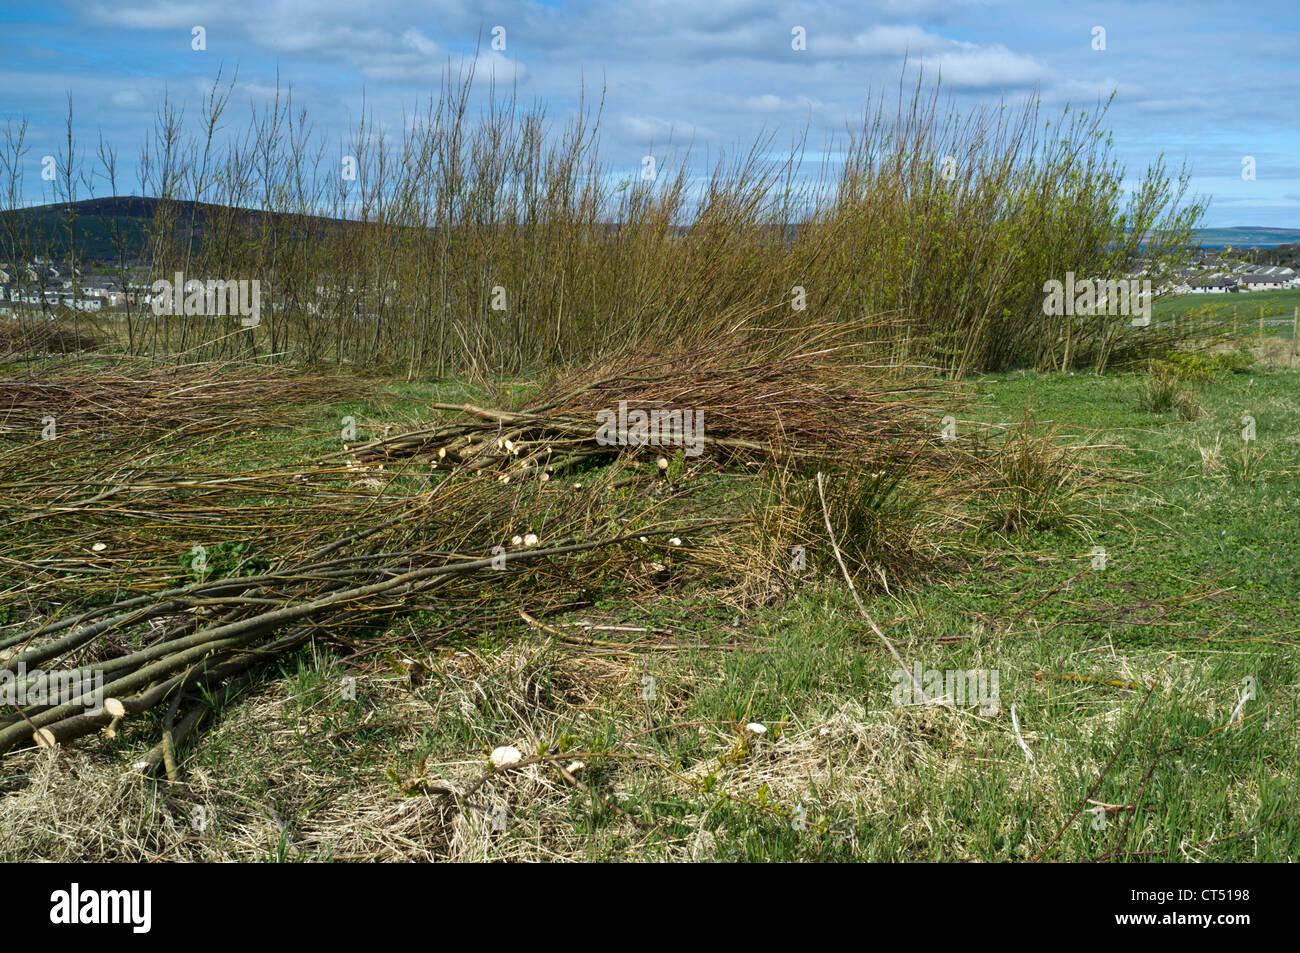 Dh BIOMASSE DE willow Biomasse Forschung crop Field Trial Schottland erneuerbare uk Kulturpflanzen Kraftstoff Stockbild